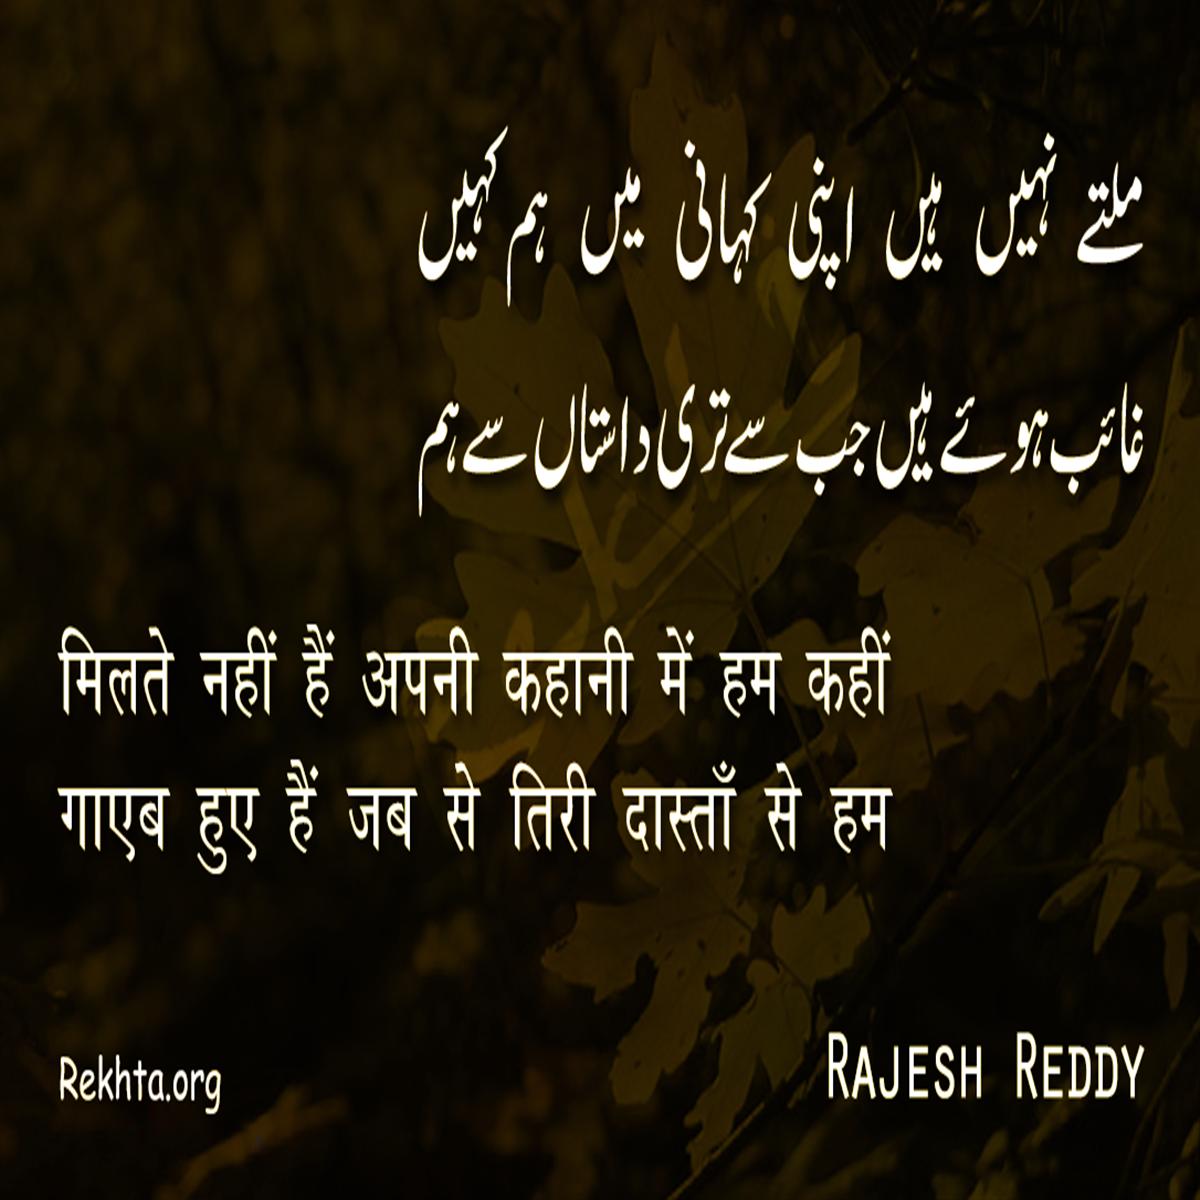 Rajesh Reddy